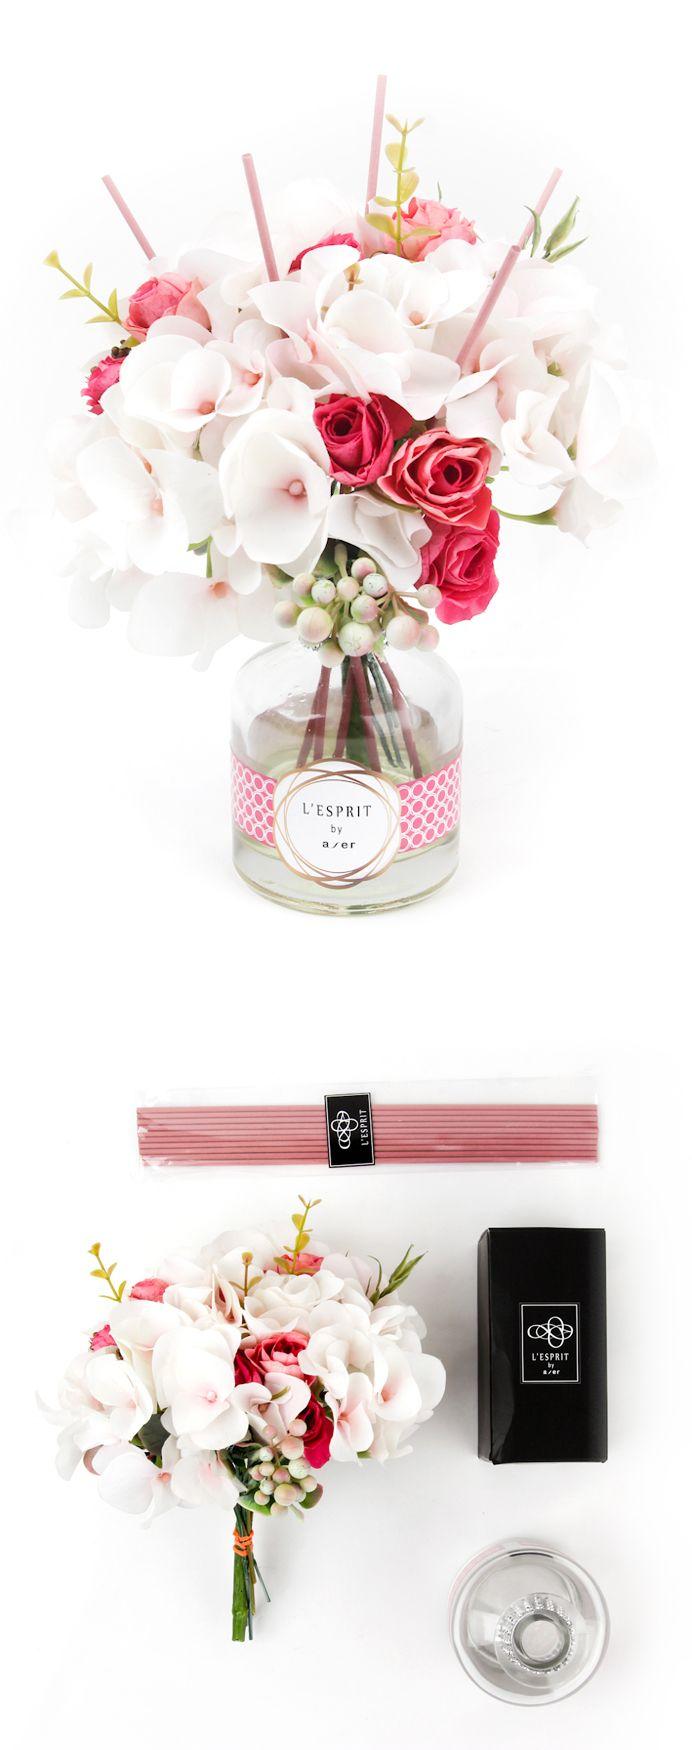 Cute idea for a DIY reed diffuser!